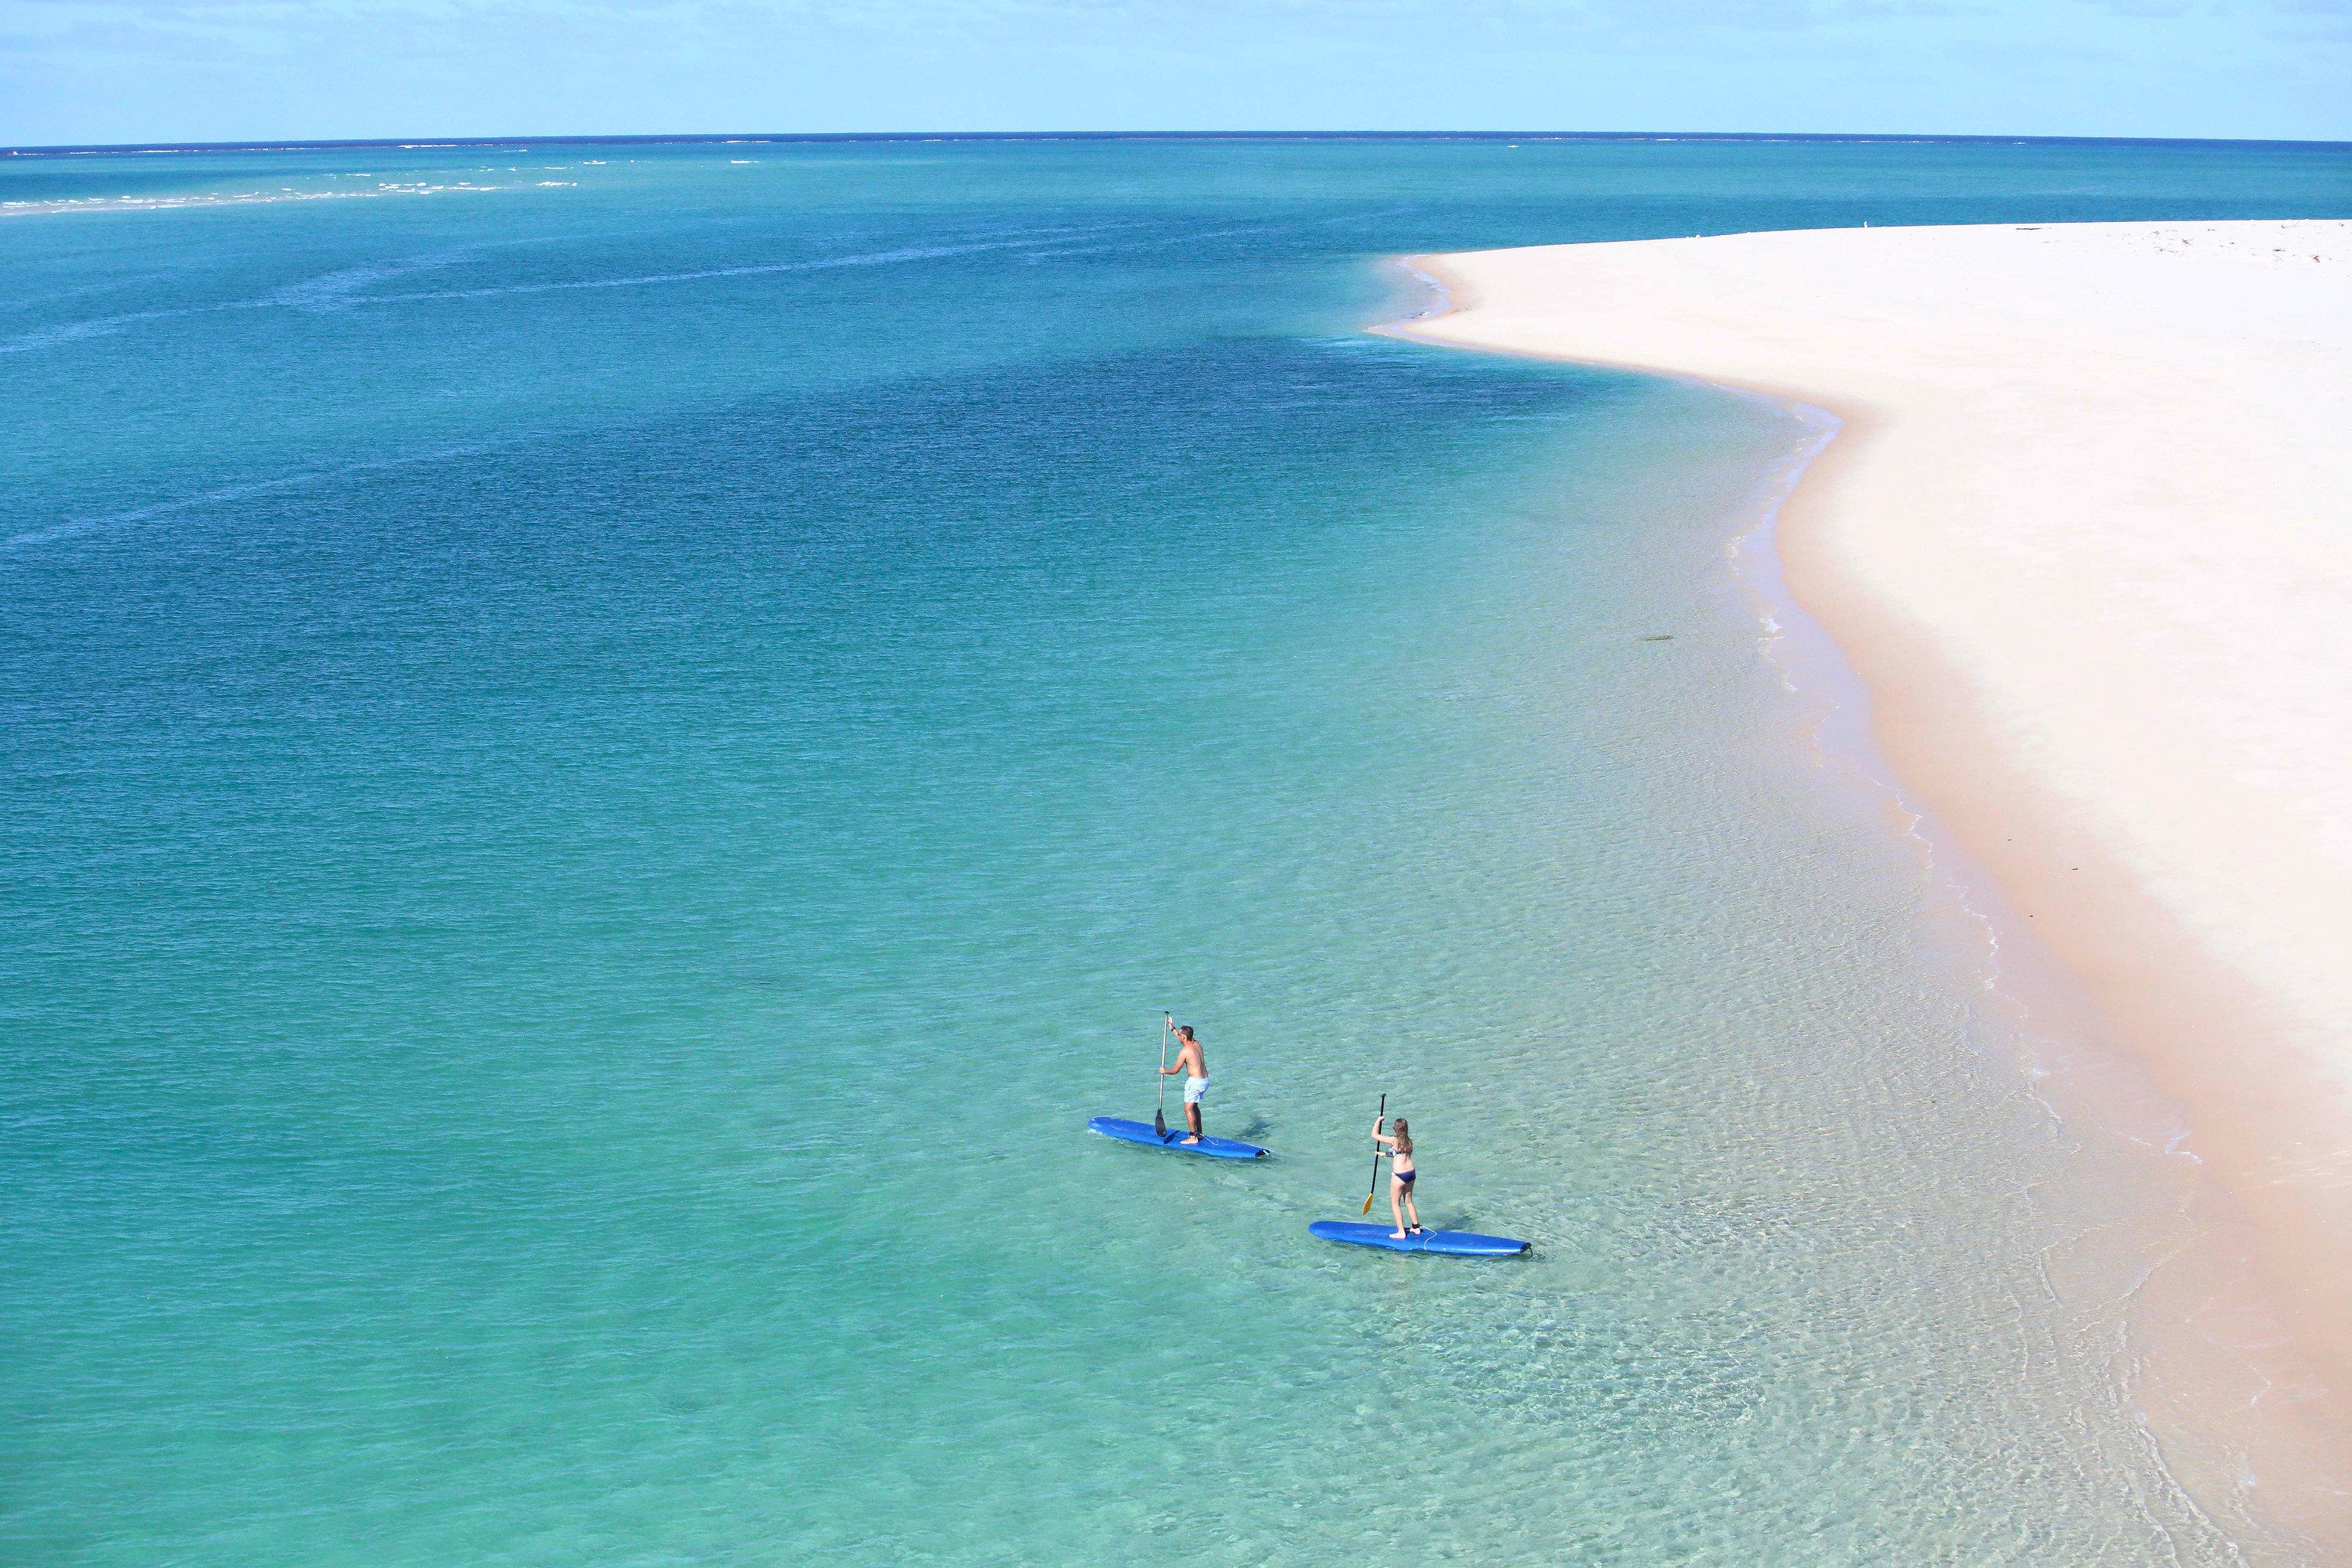 water sky Ocean Beach Sea Nature wind wave wave Coast cape Lagoon Island water sport sand shore caribbean blue swimming clear